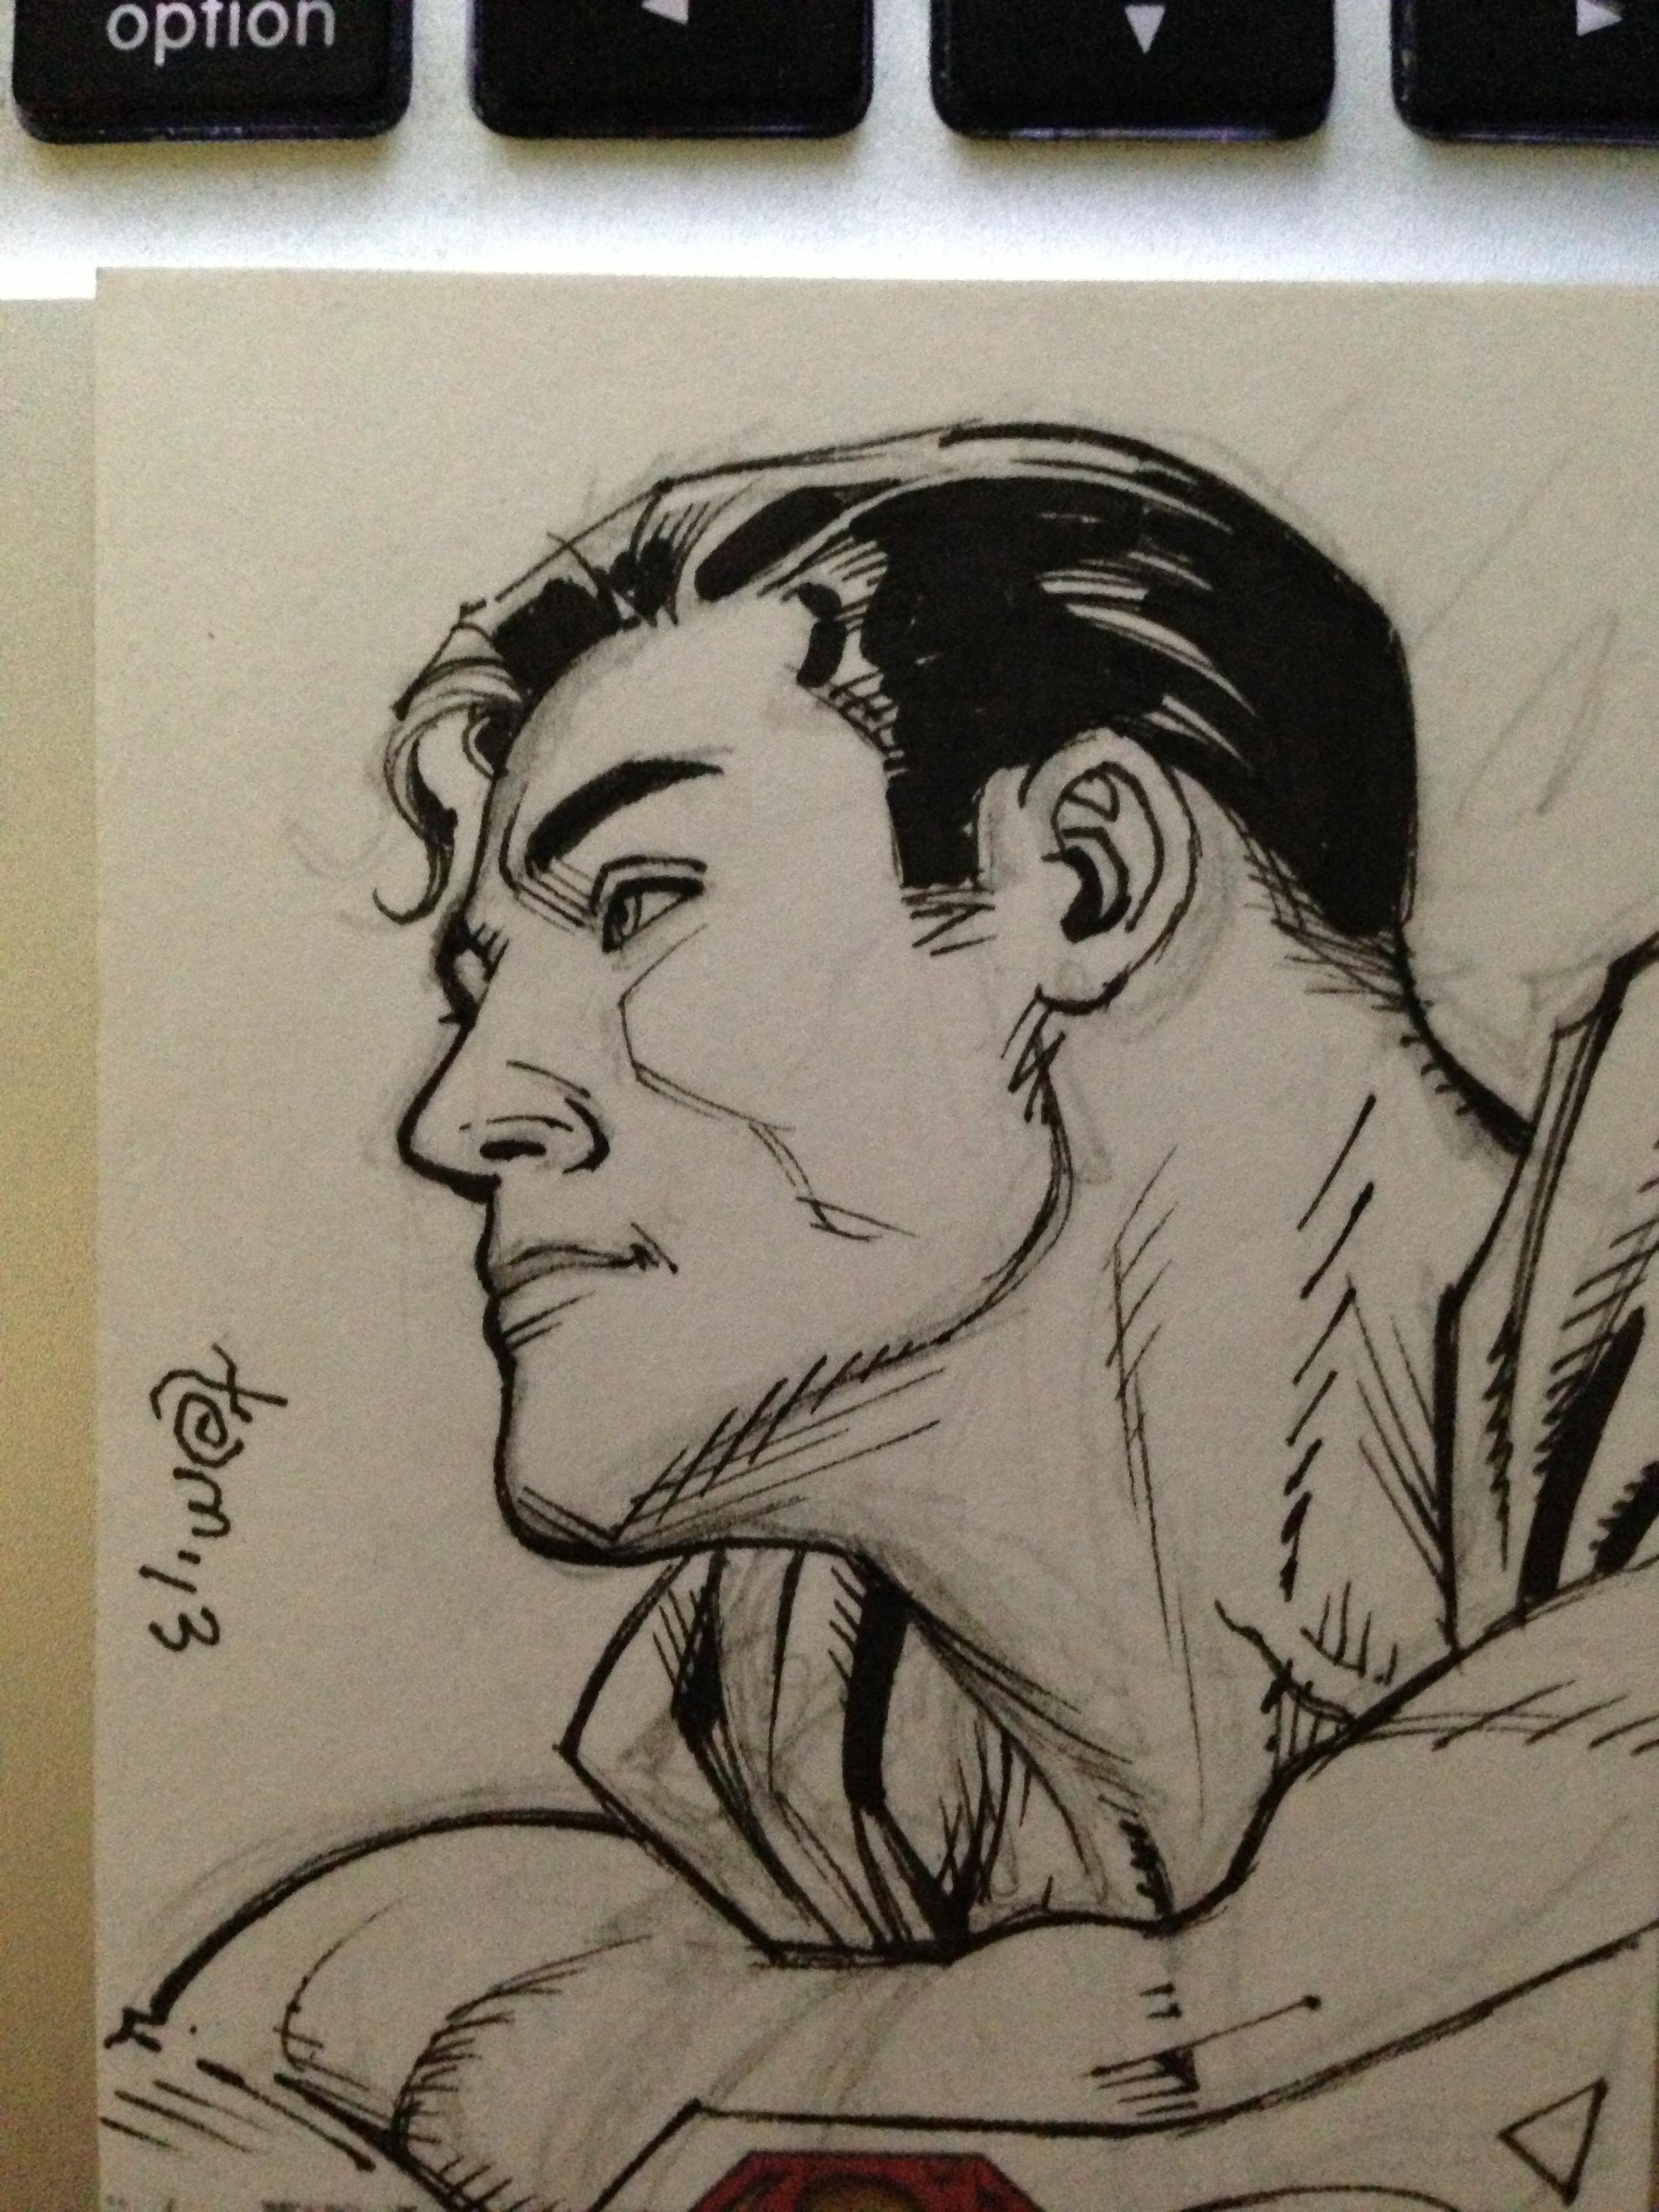 Superman head card sketch for Ryan, winner of another   Art Samura  i workshop contest.